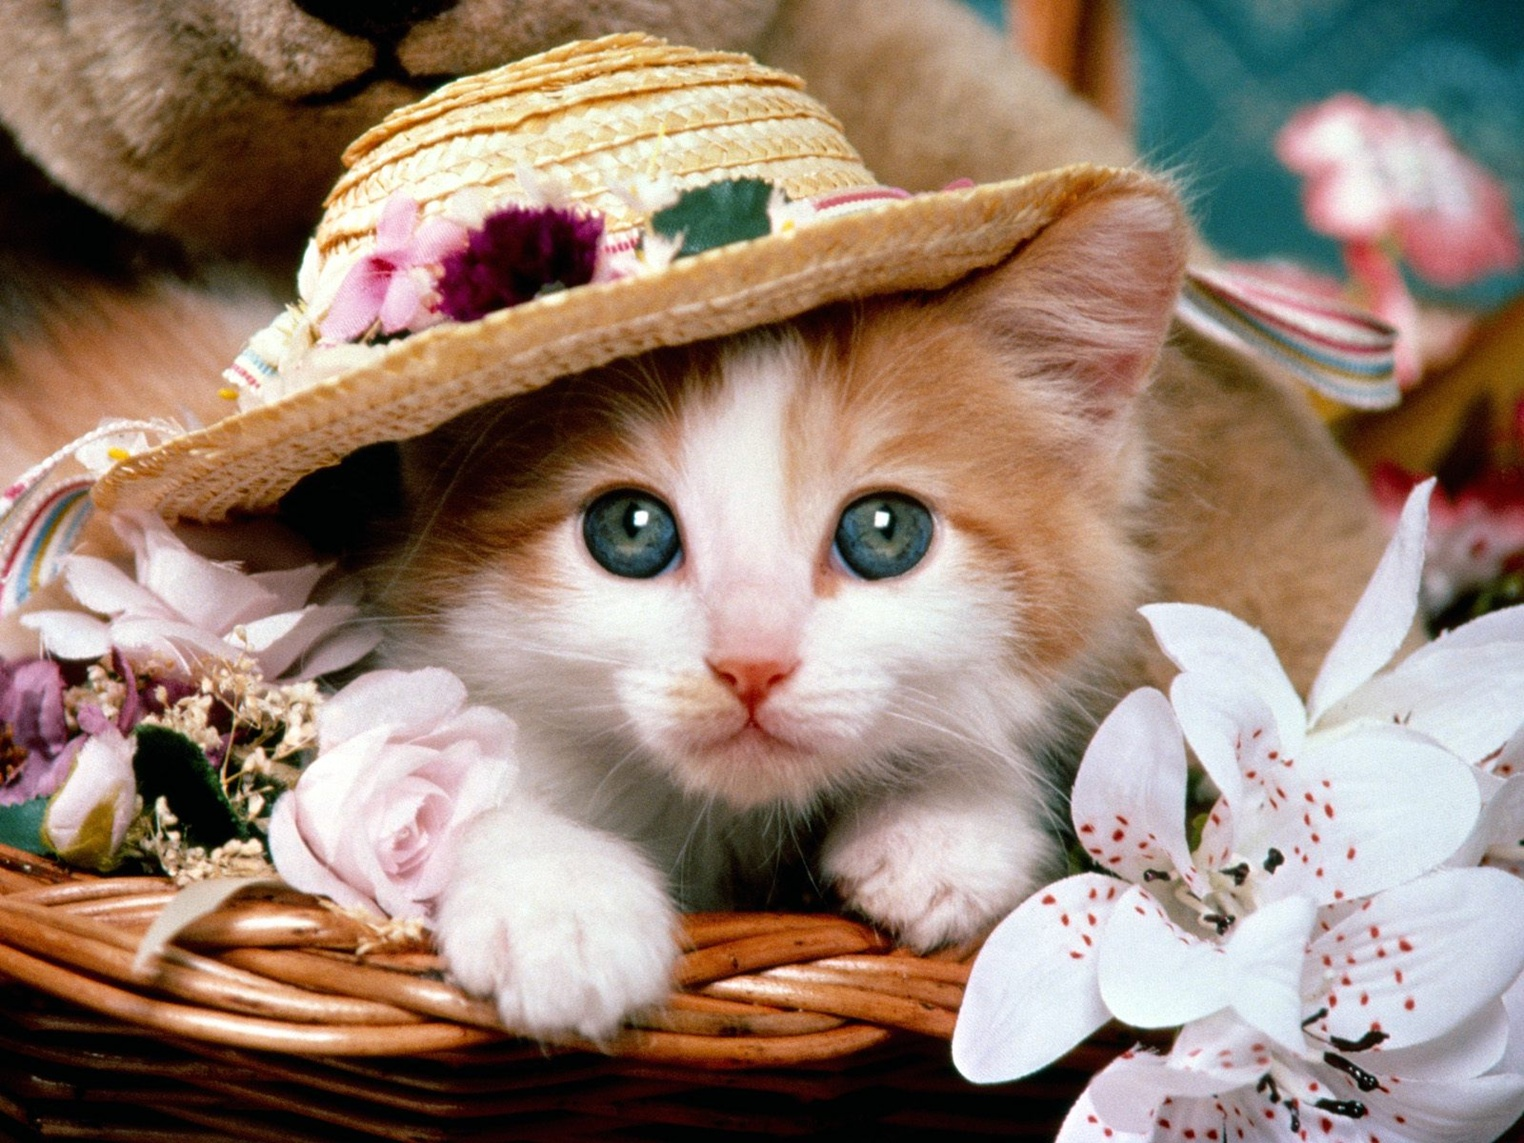 Cute Cat Iphone Wallpaper 1524x1143